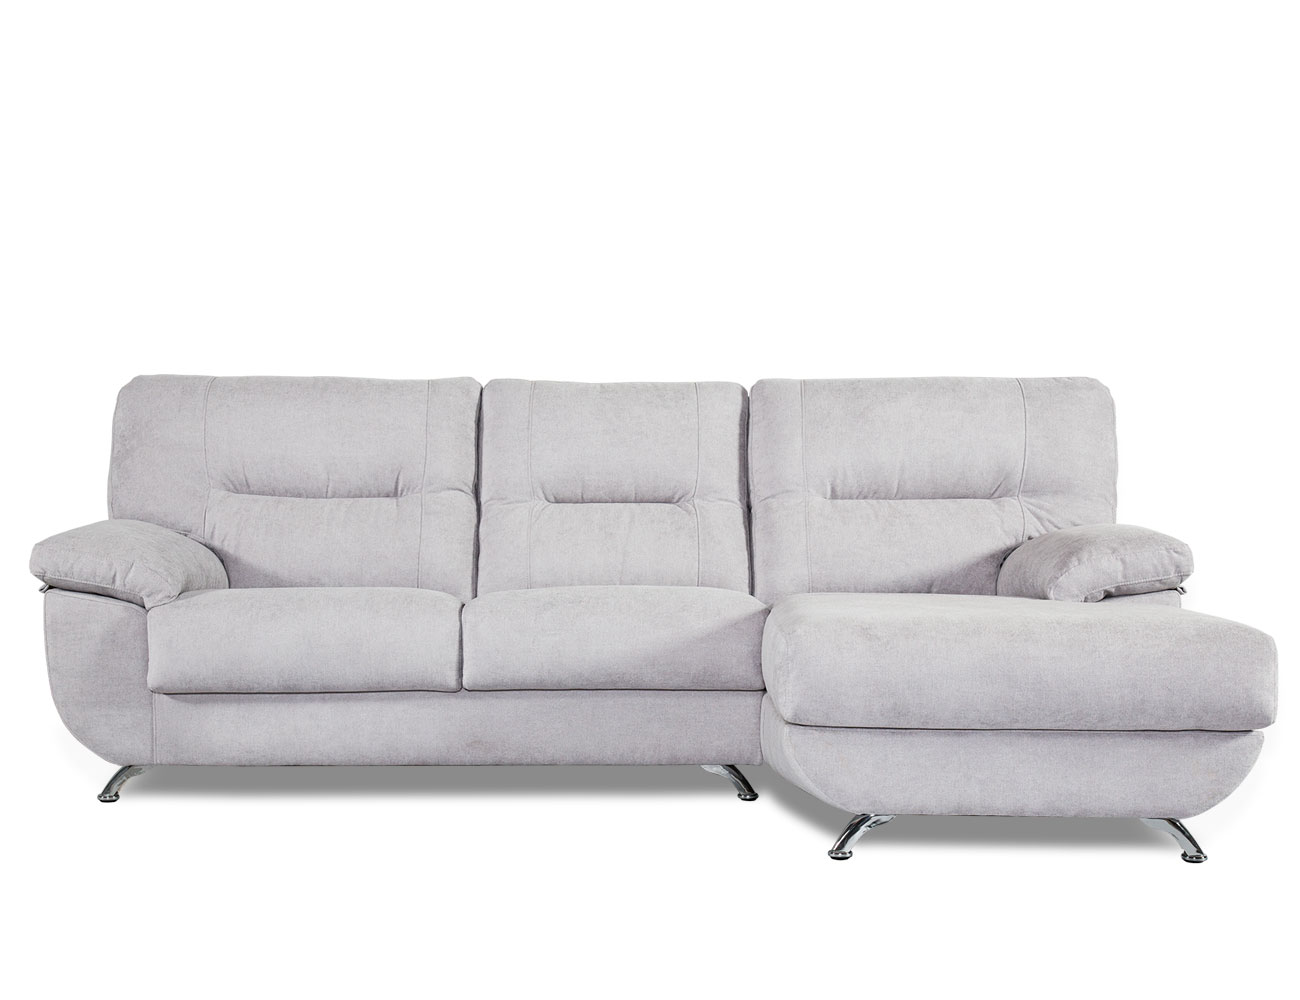 Sofa chaiselongue moderno patas cromadas forma